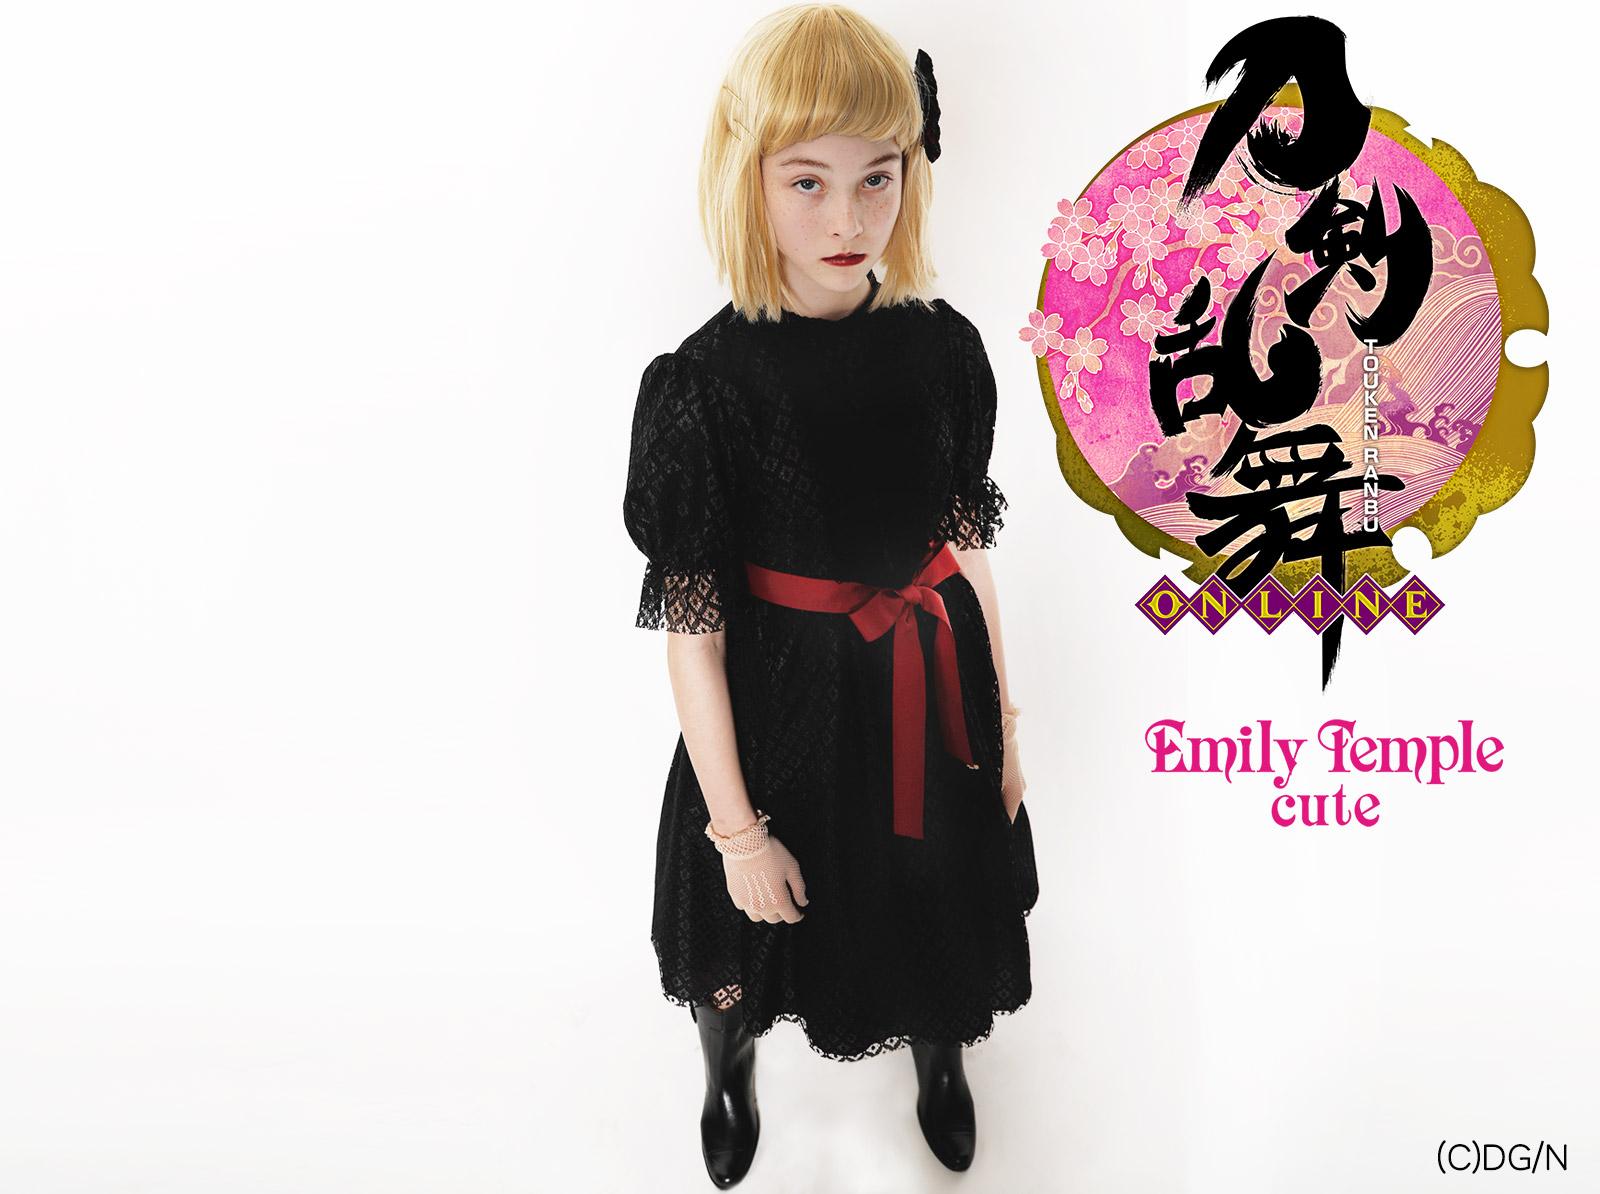 http://www.emilytemple-cute.com/news/collaboration-main.jpg